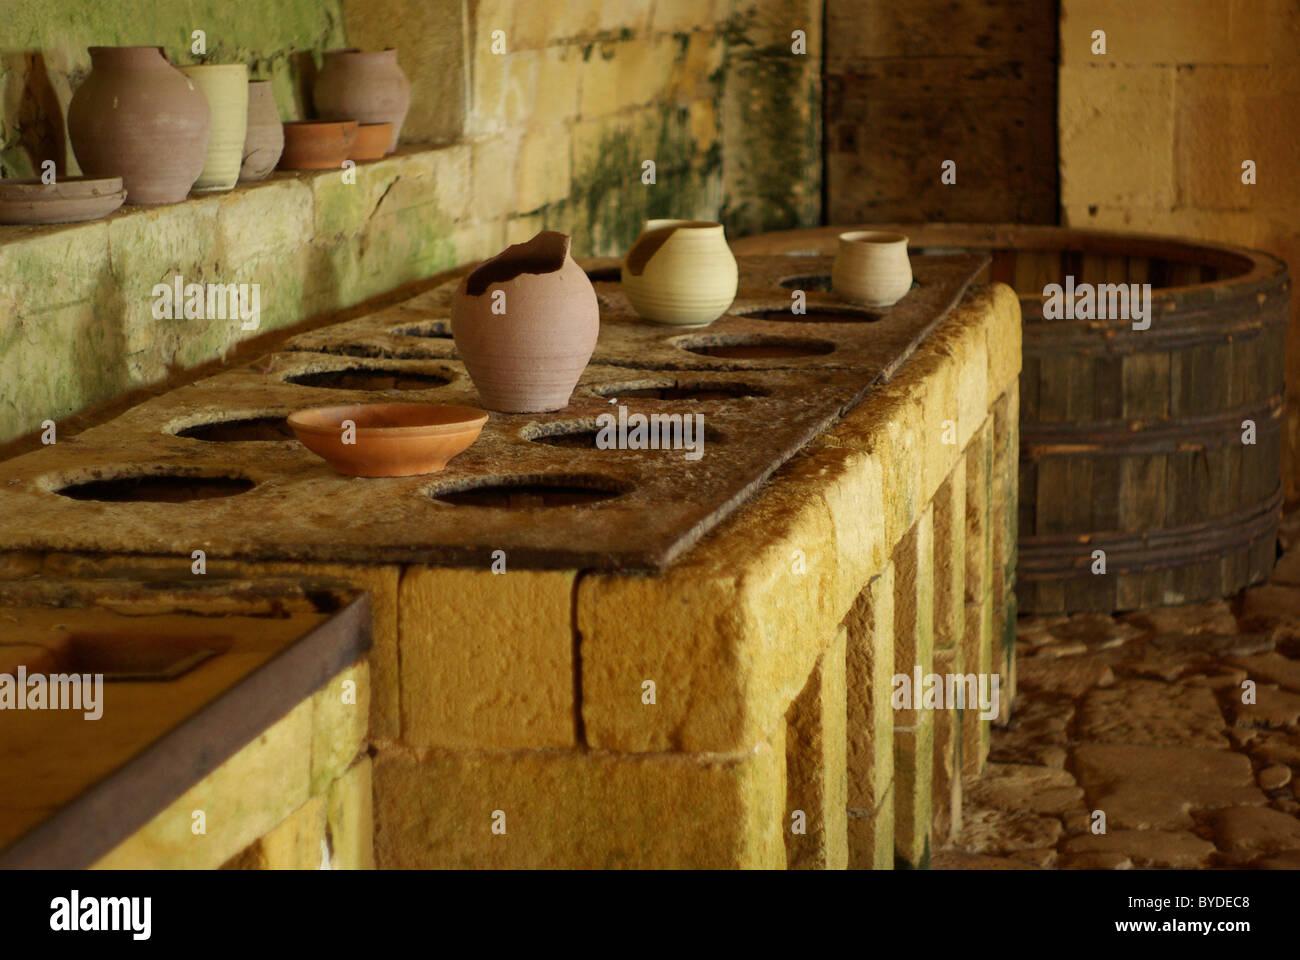 Mittelalter Küche | Mittelalterliche Kuche Stockfoto Bild 34102776 Alamy